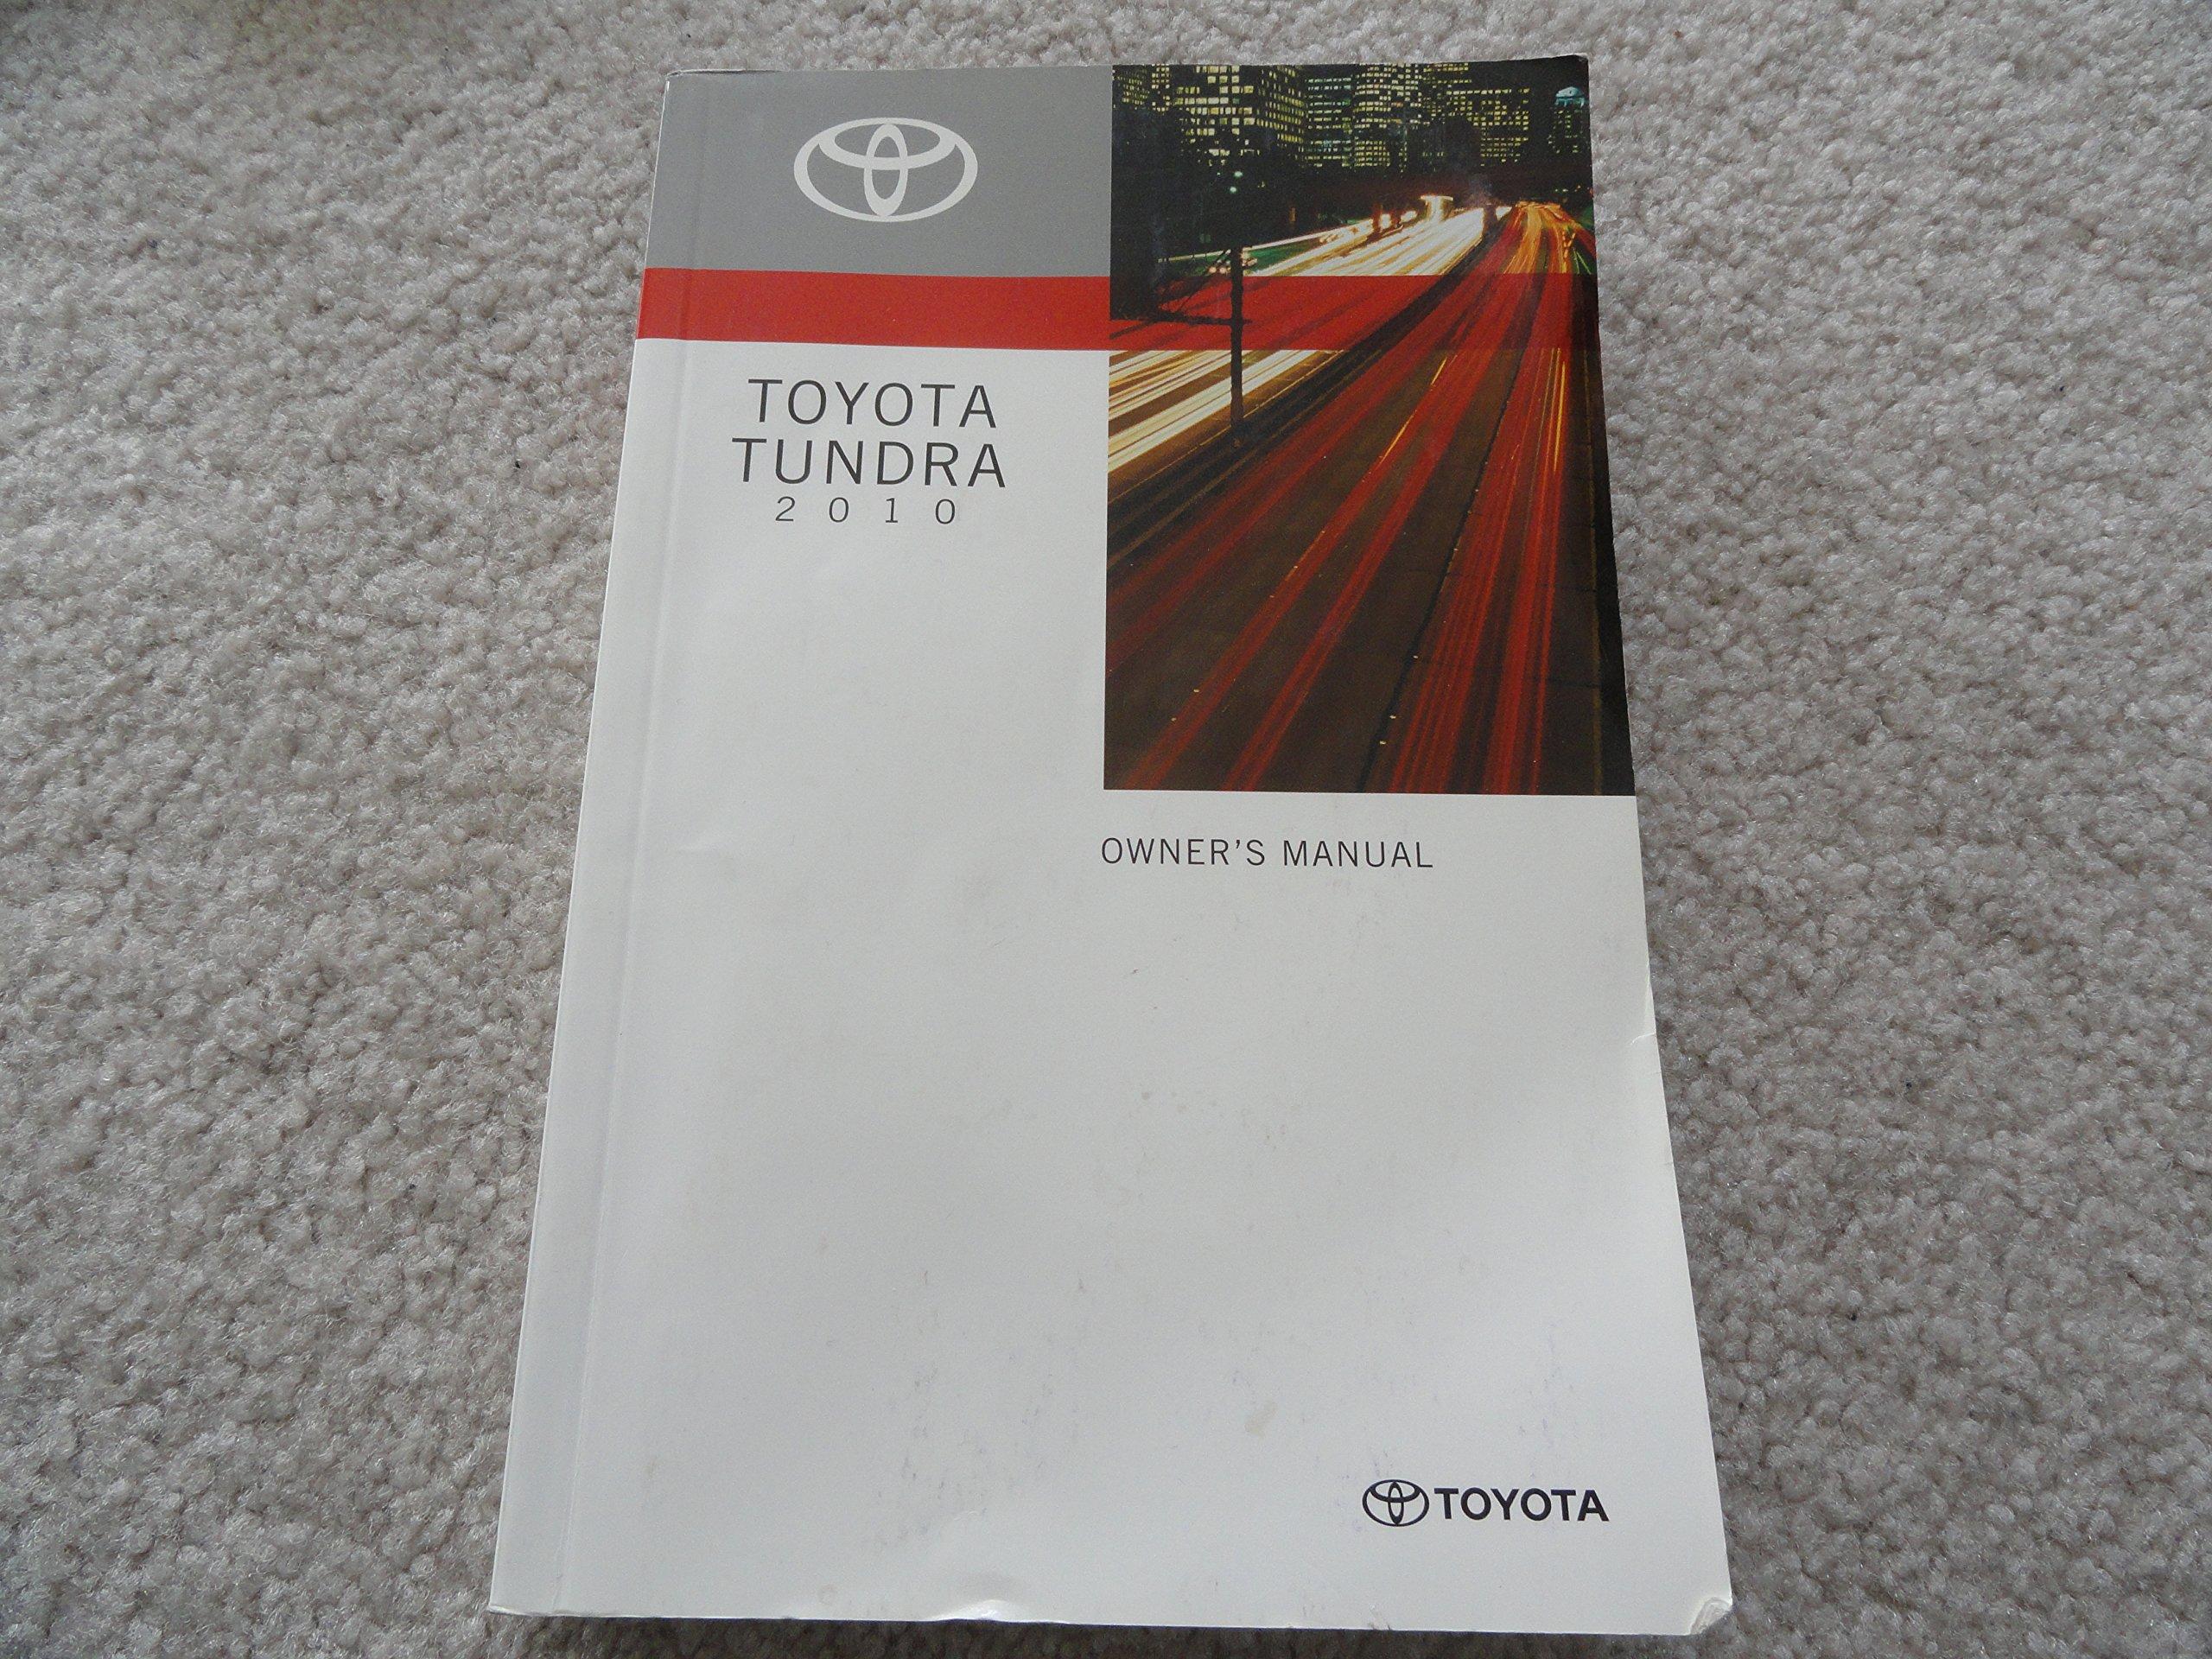 2010 toyota tundra owners manual toyota amazon com books rh amazon com Toyota Tundra Repair 2005 Toyota Tundra Manual Online